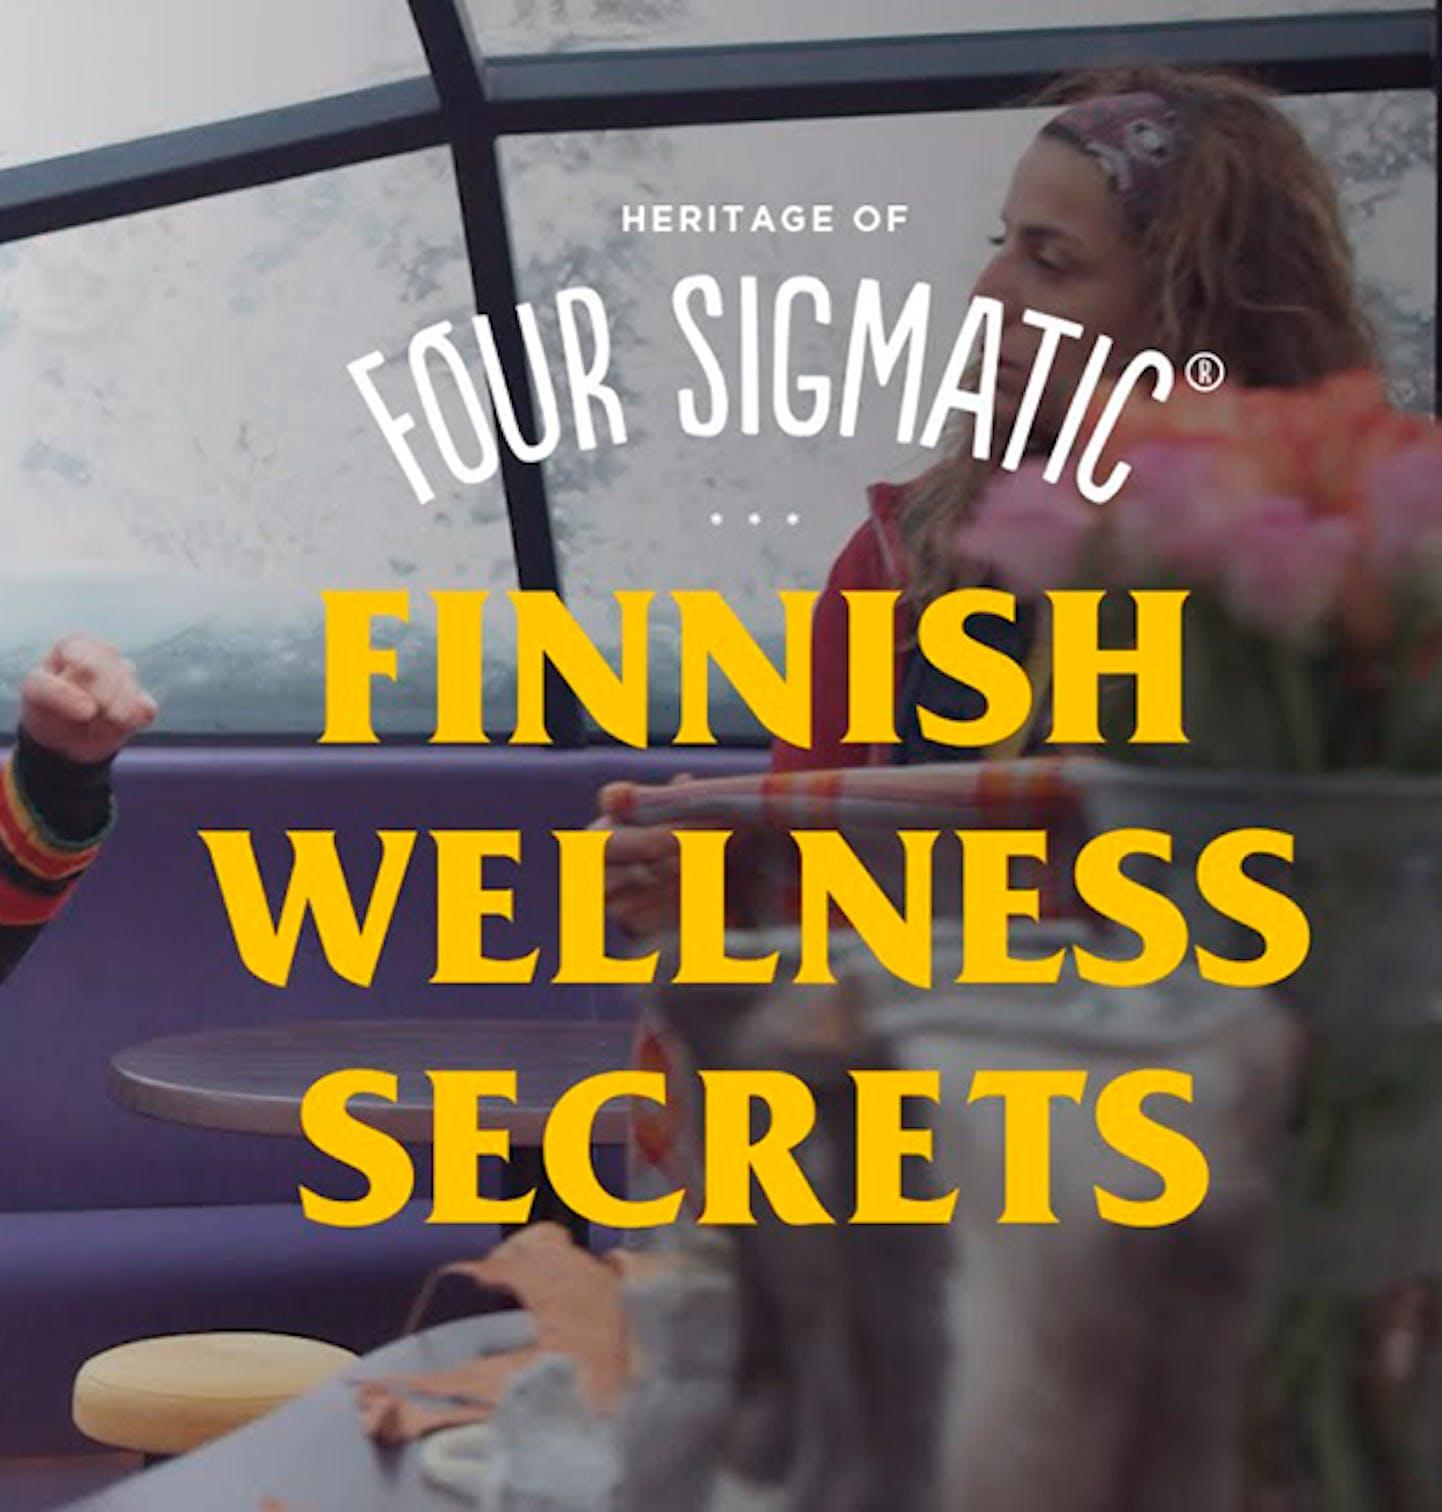 Finnish wellness secrets